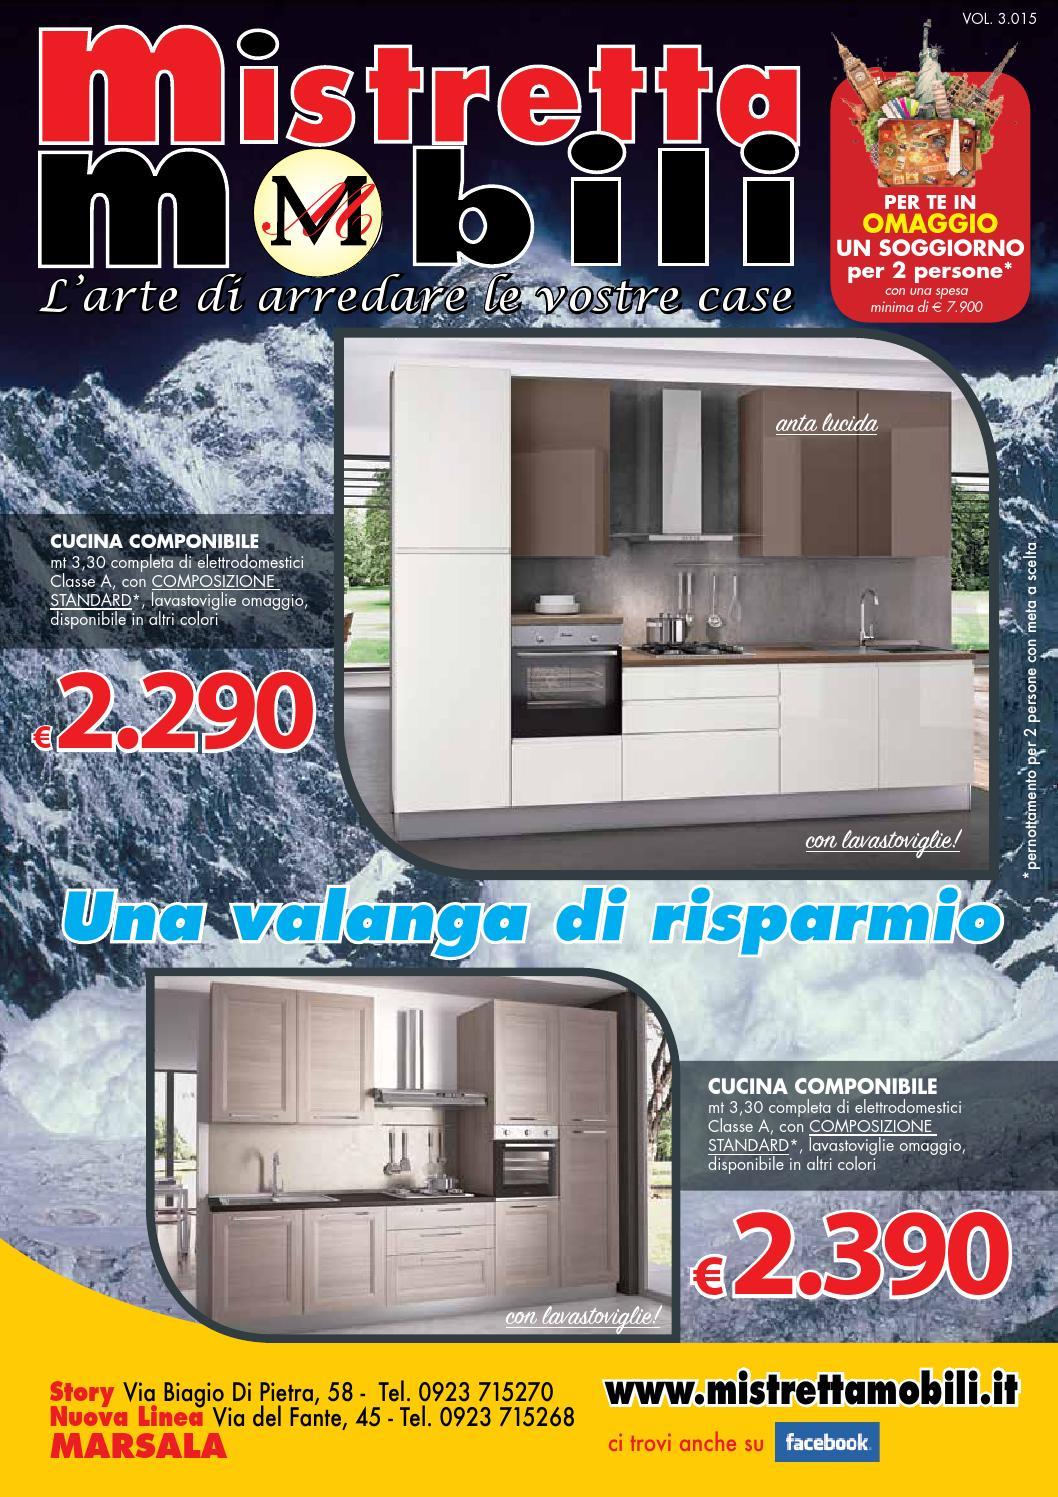 Volantino natale 2015 by mistretta mobili issuu for Volantino bricofer marsala